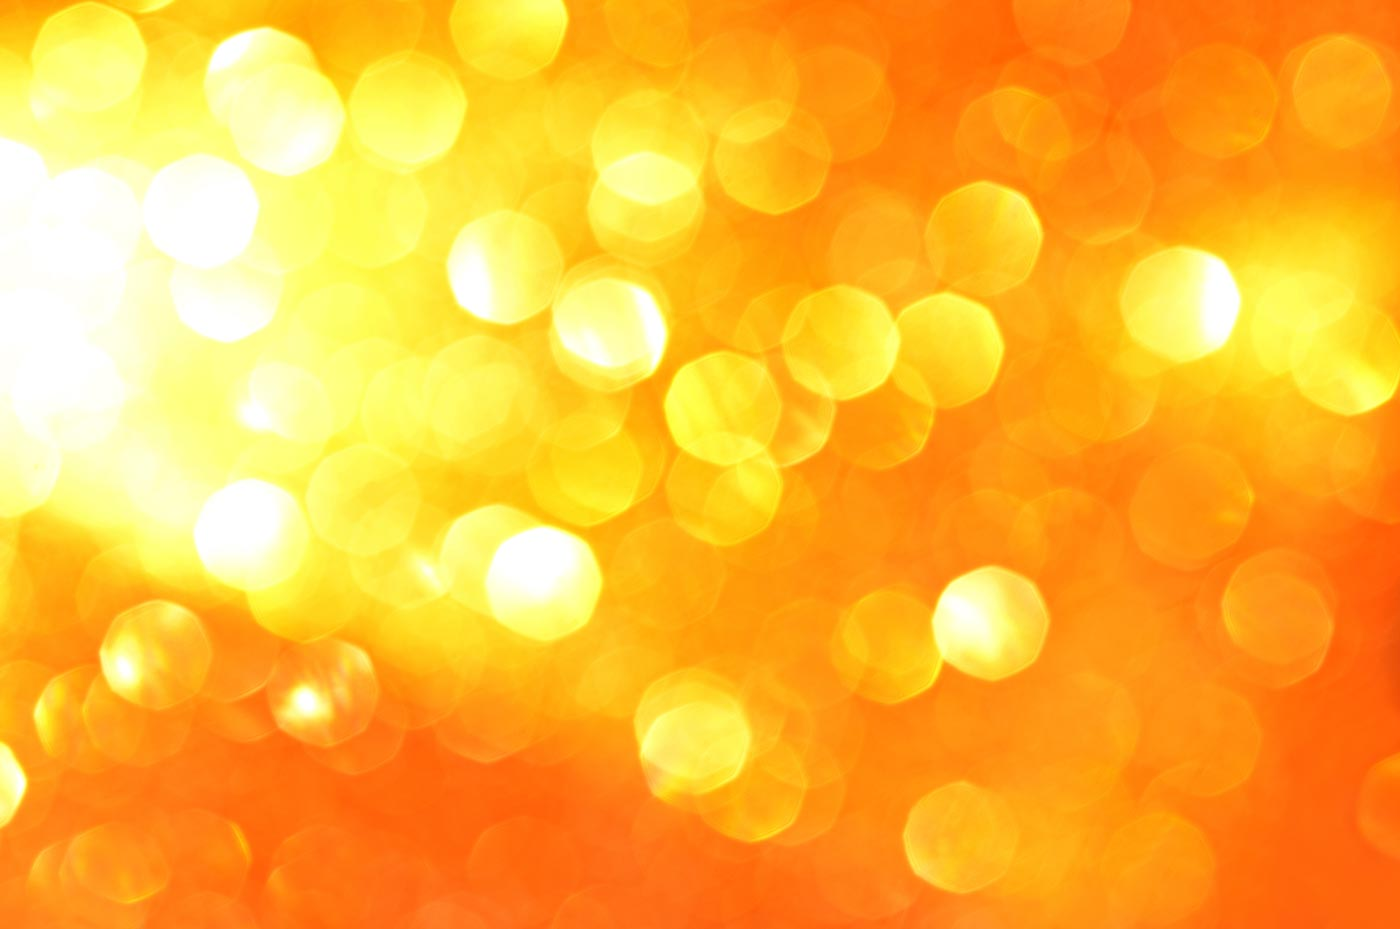 string lights orange hd wallpaper - photo #14